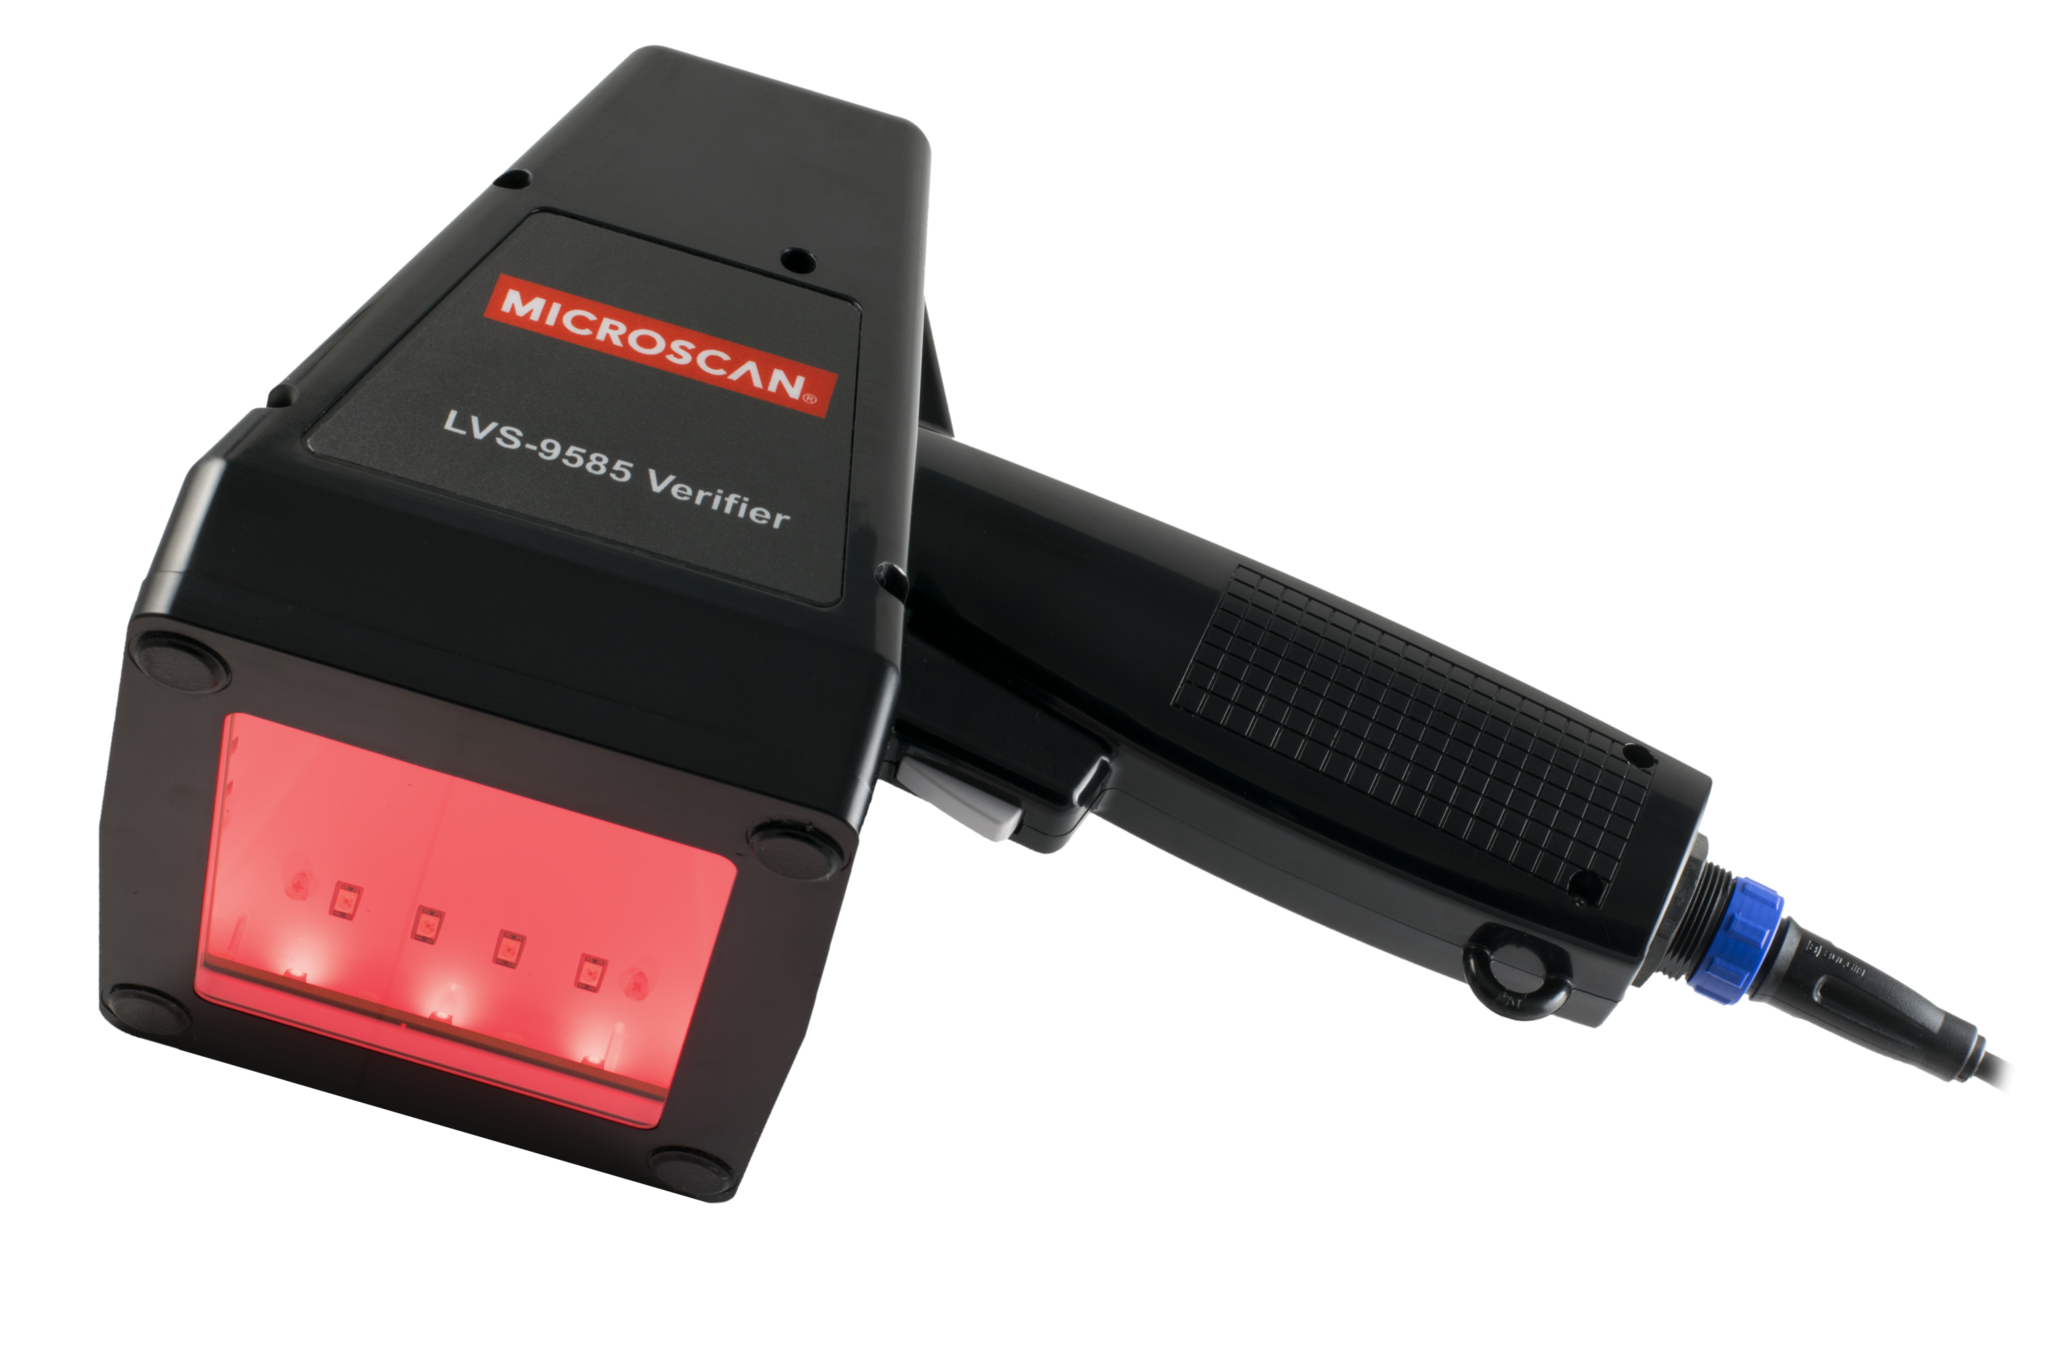 LVS-9585 Handheld Barcode Verifier